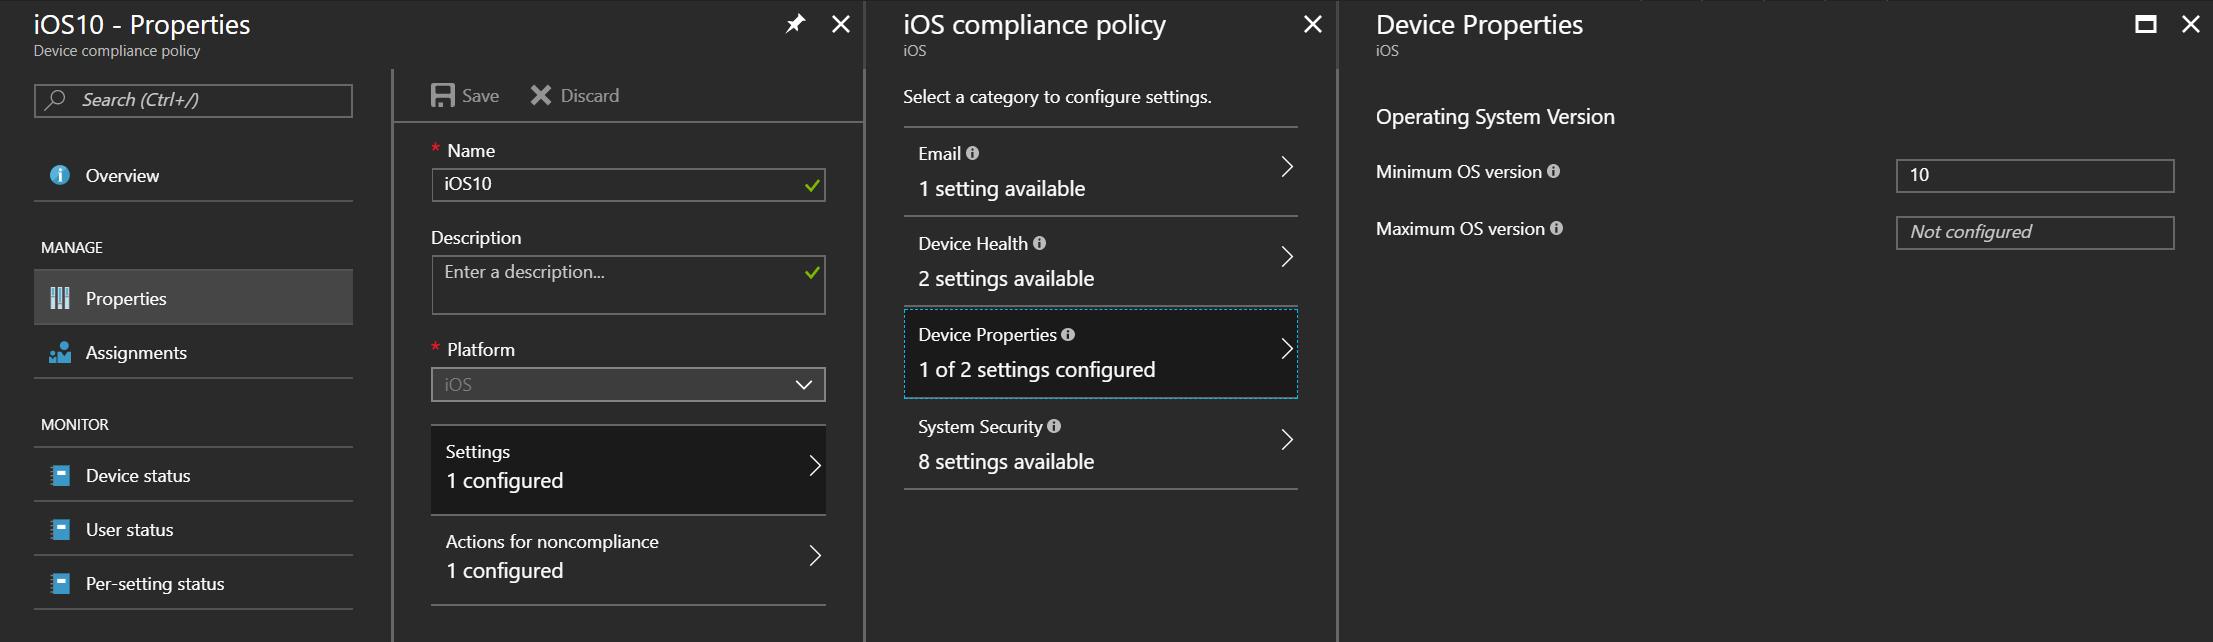 iOS 10 device properties